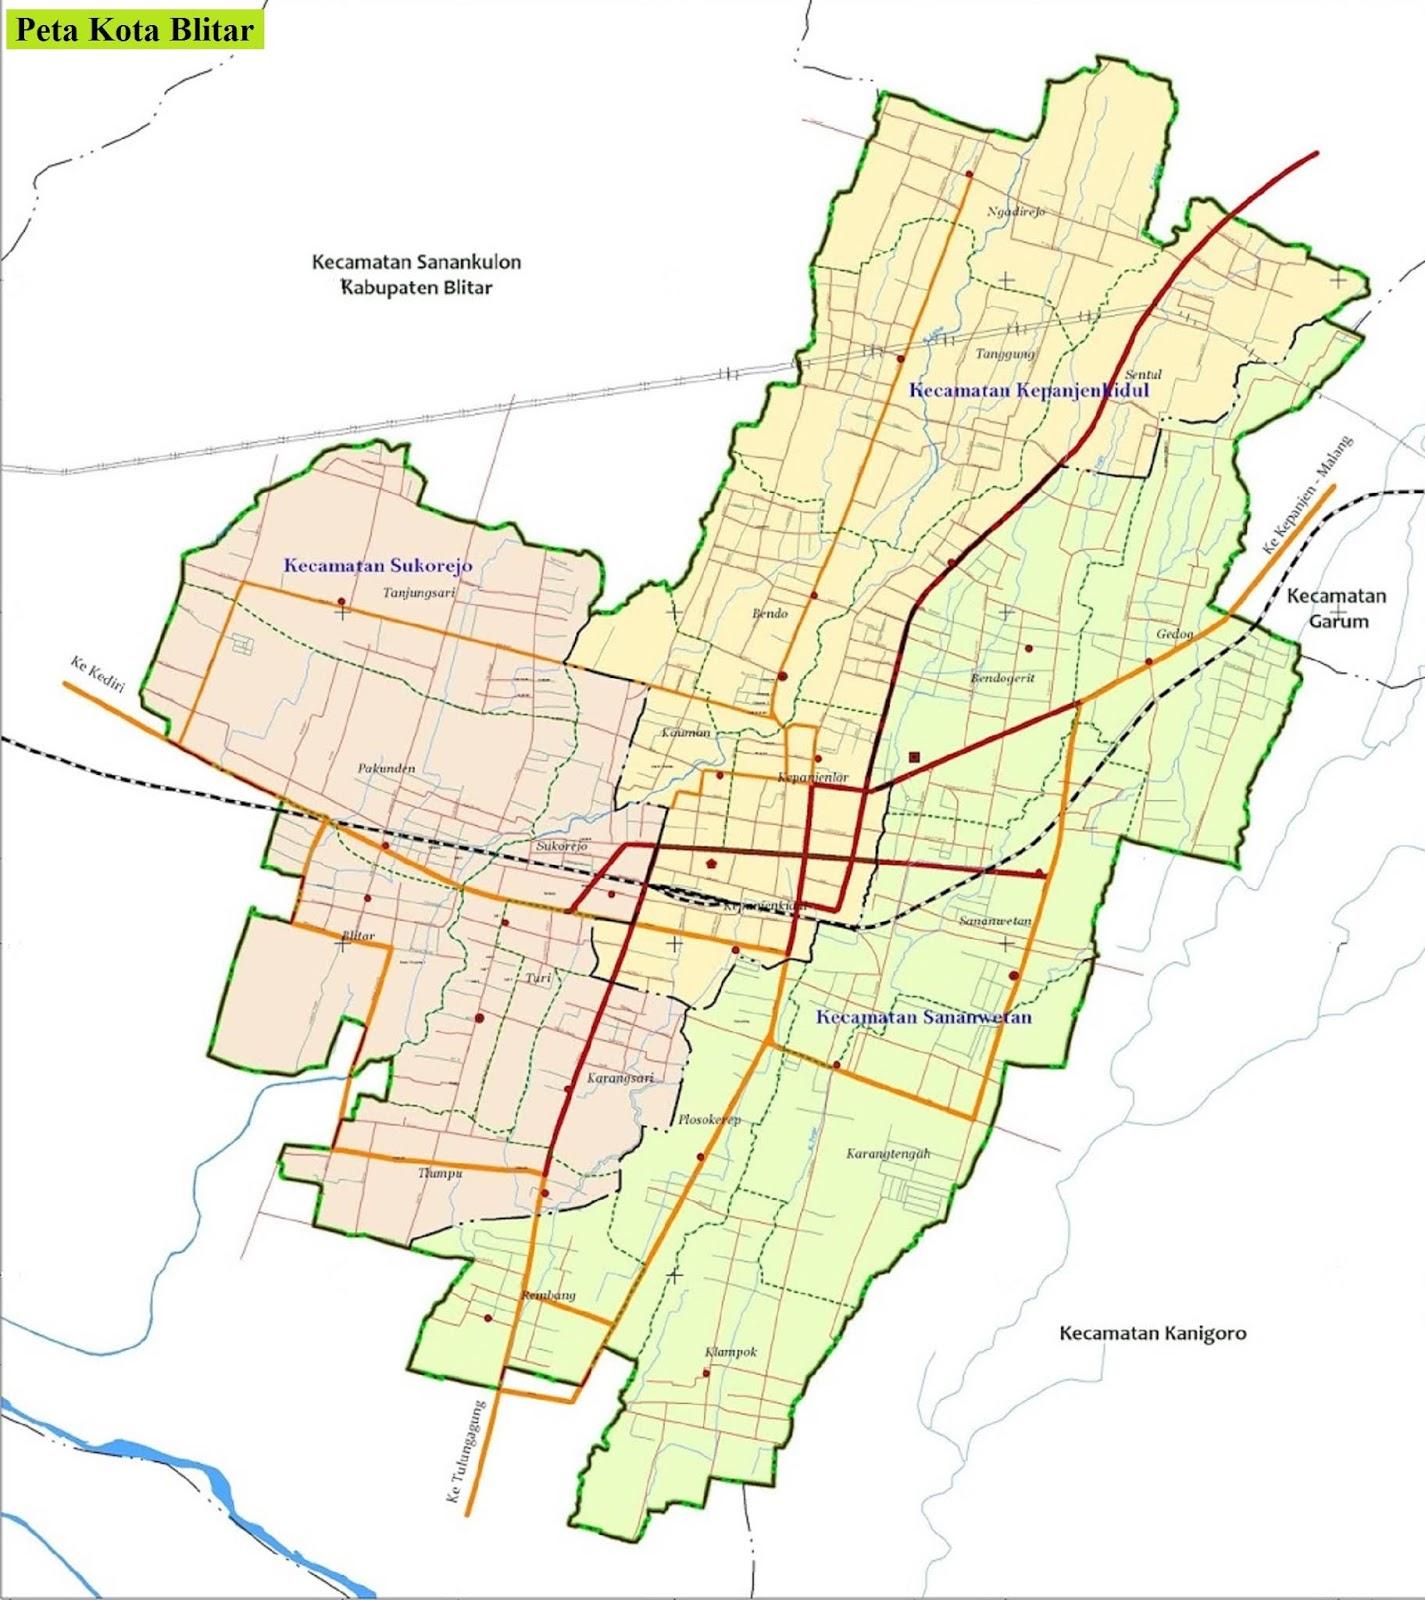 Peta Kota Blitar HD